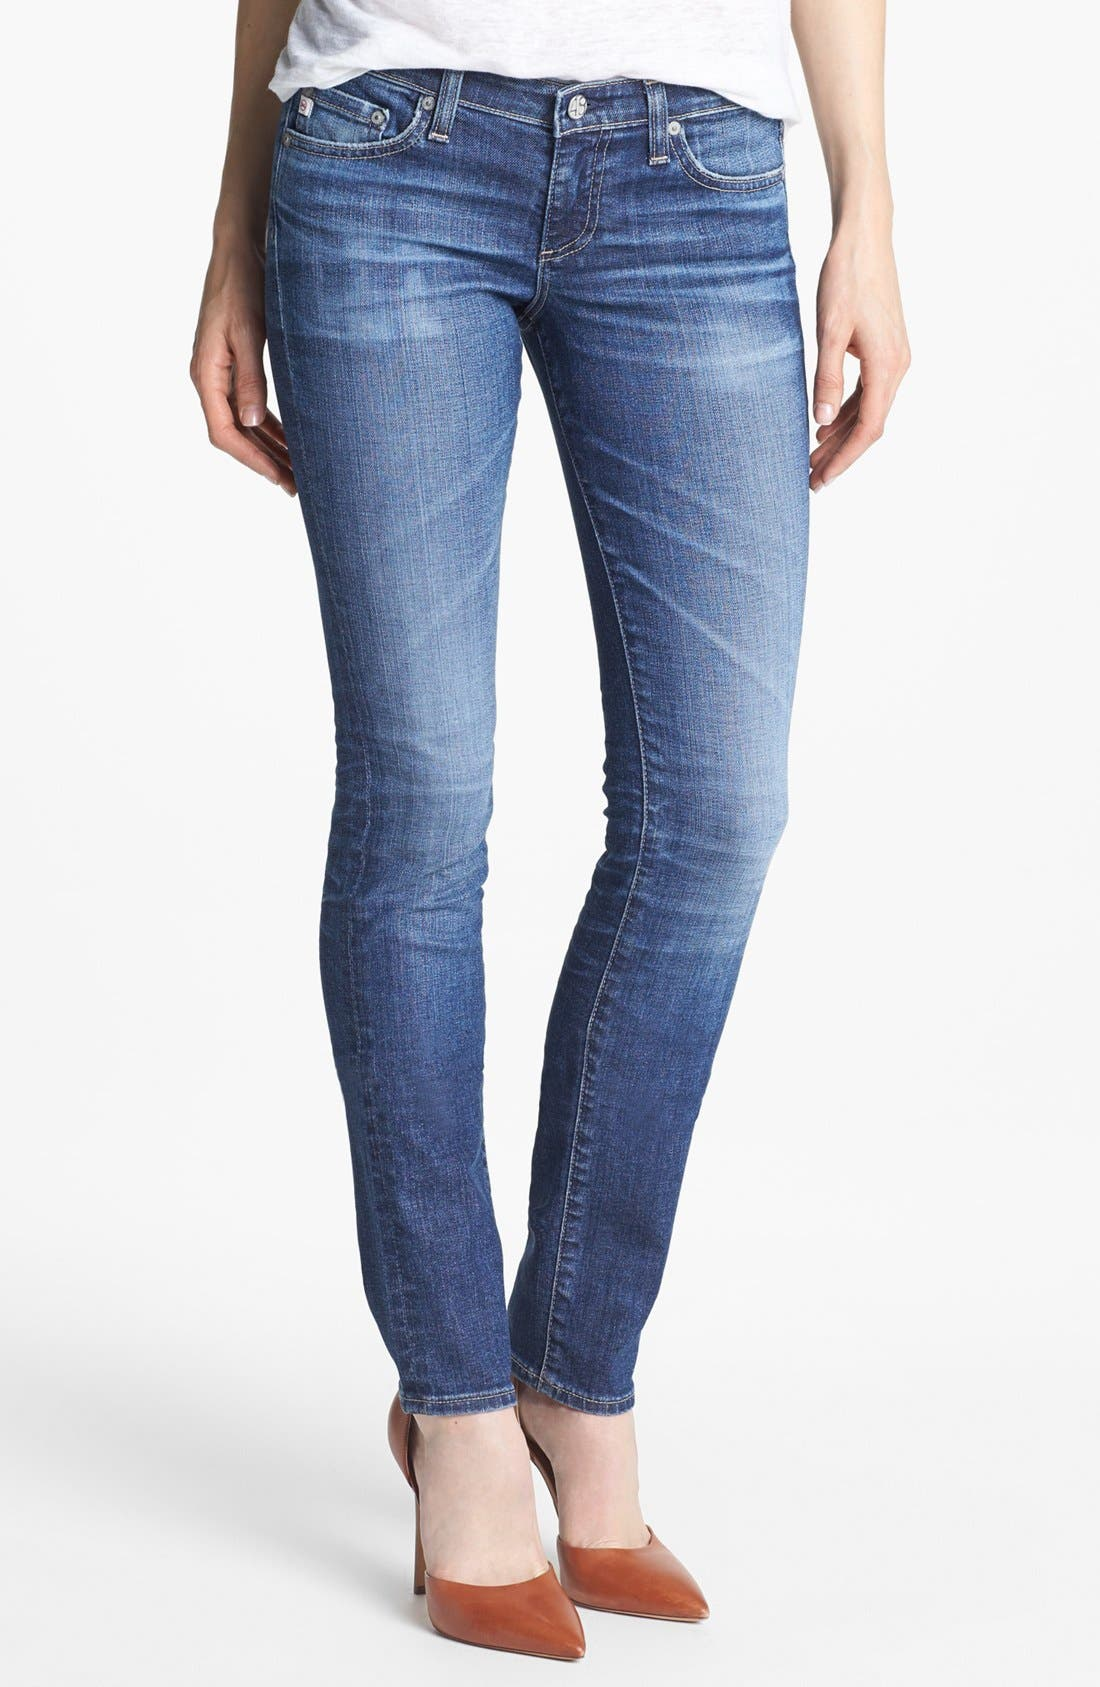 Alternate Image 1 Selected - AG 'Aubrey' Skinny Straight Leg Jeans (10 Year Daybreaker)